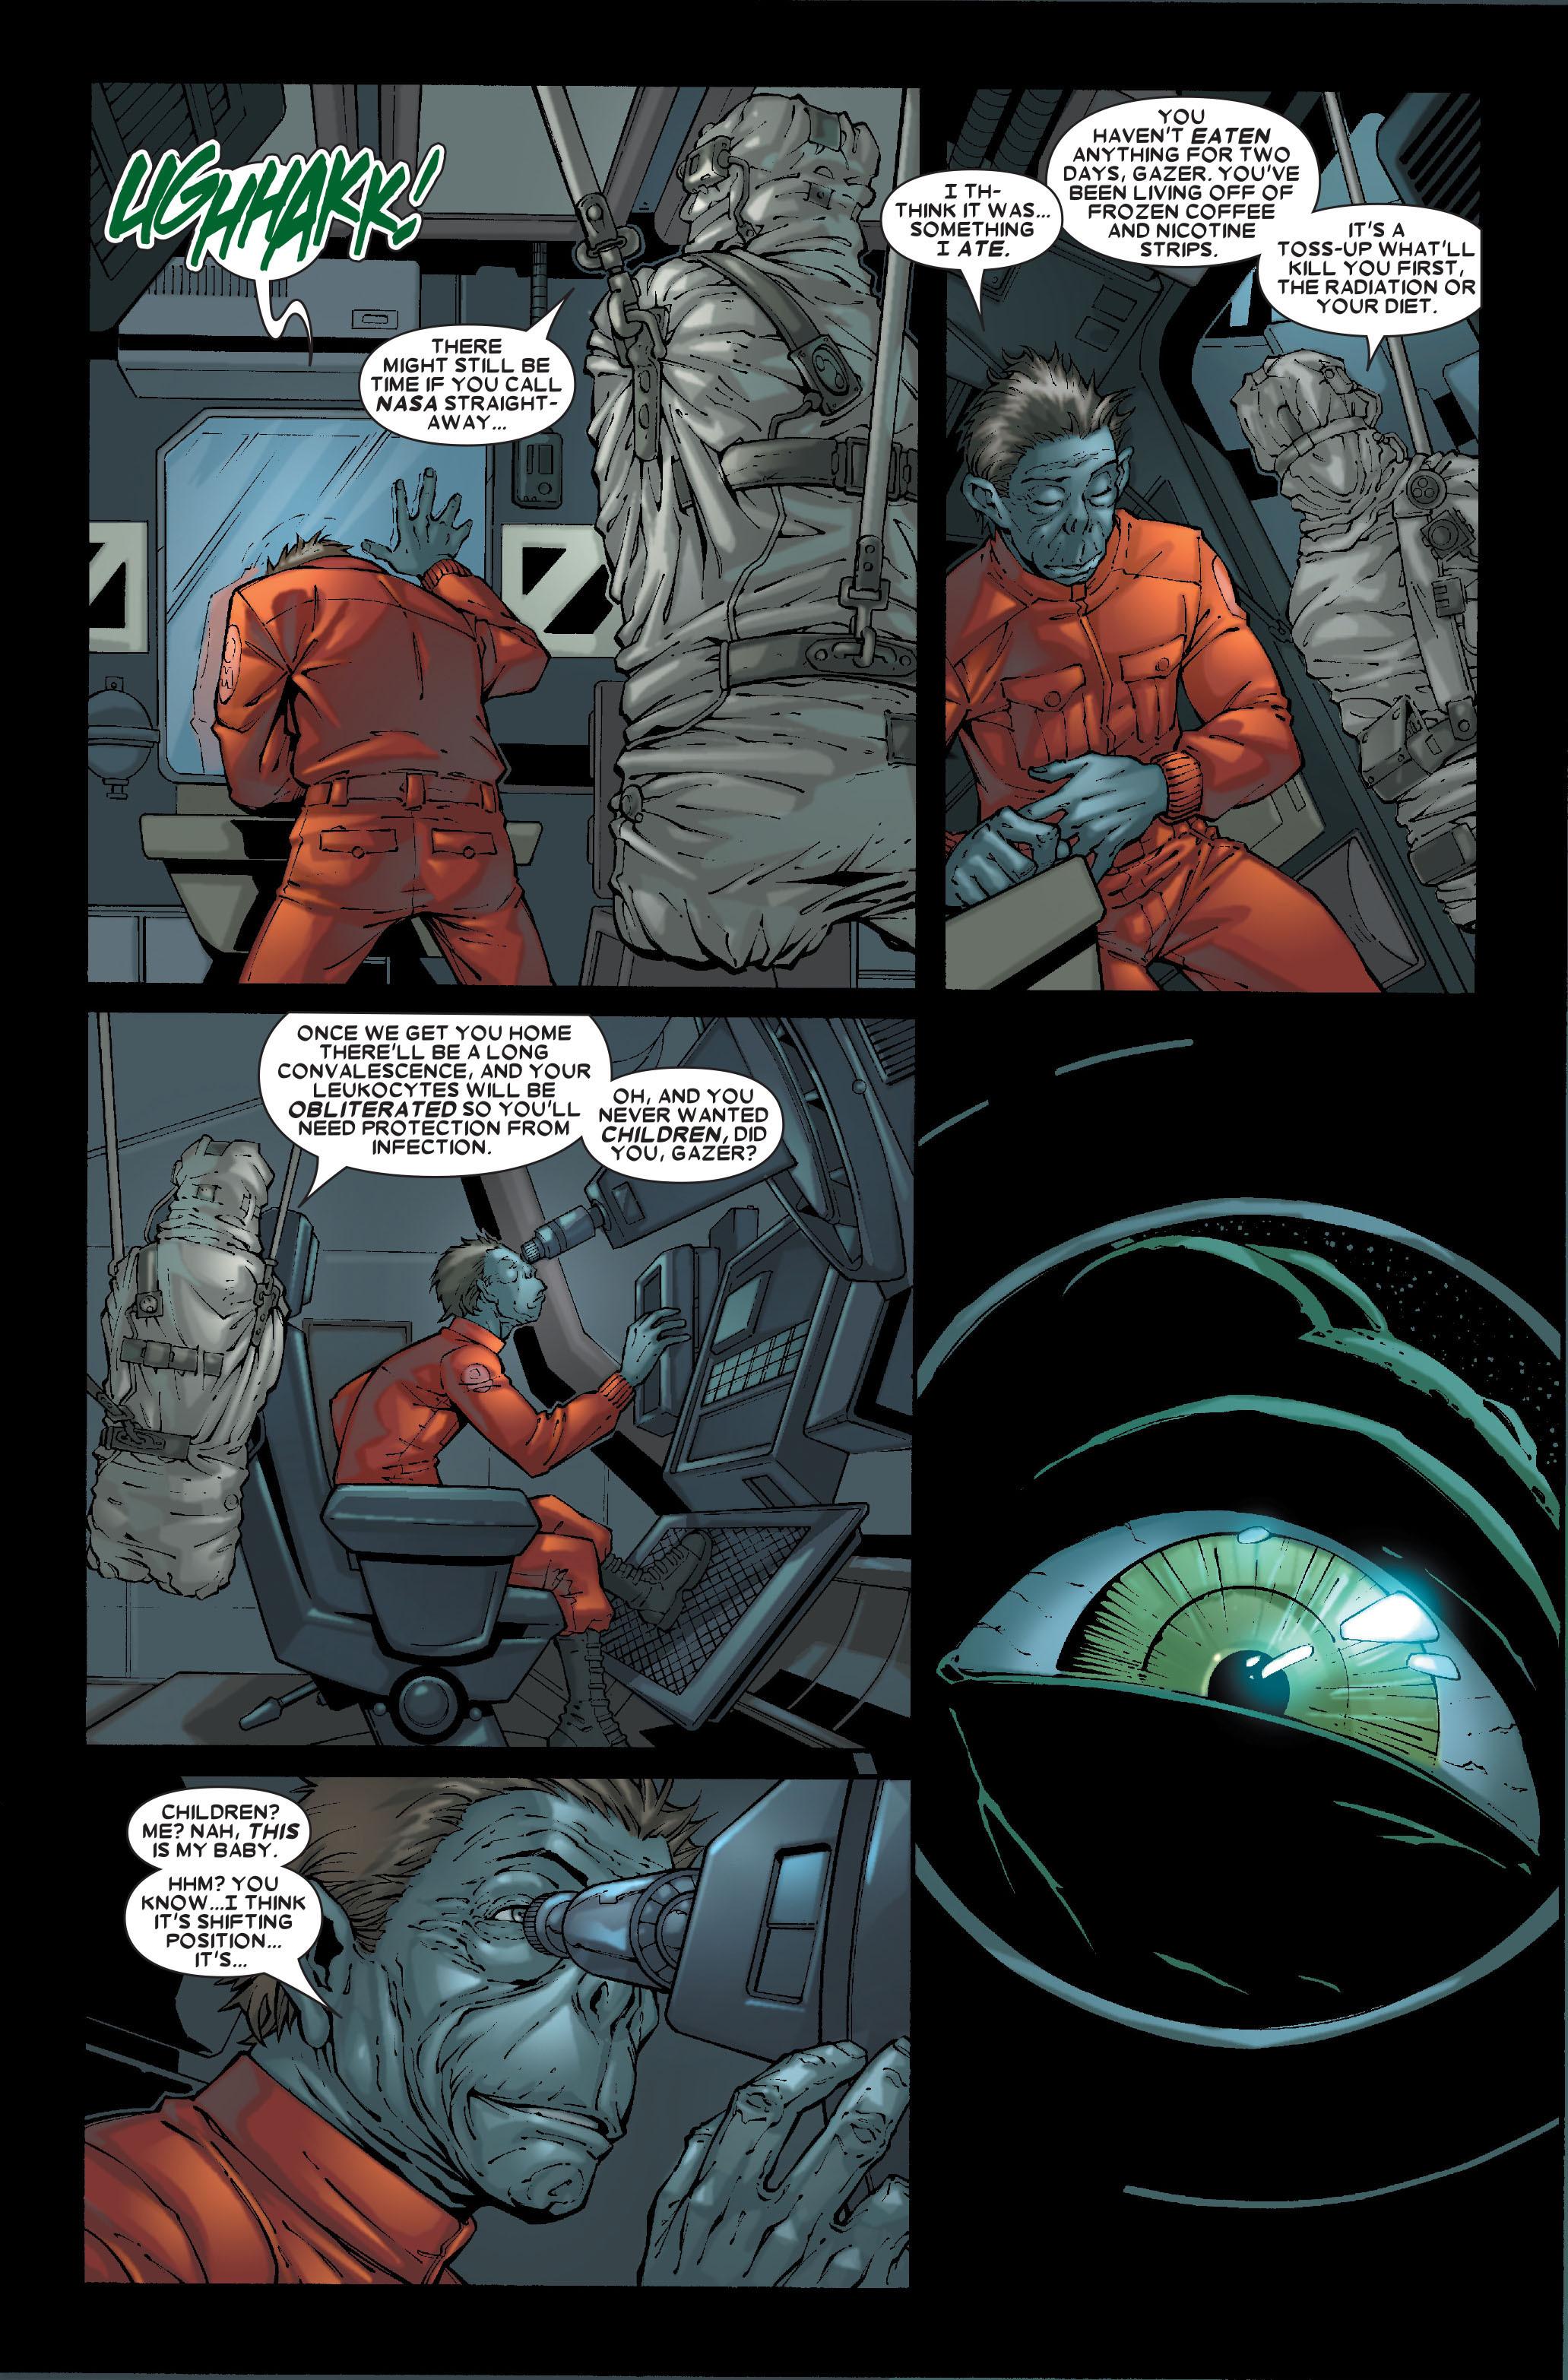 X-Men (1991) 180 Page 10